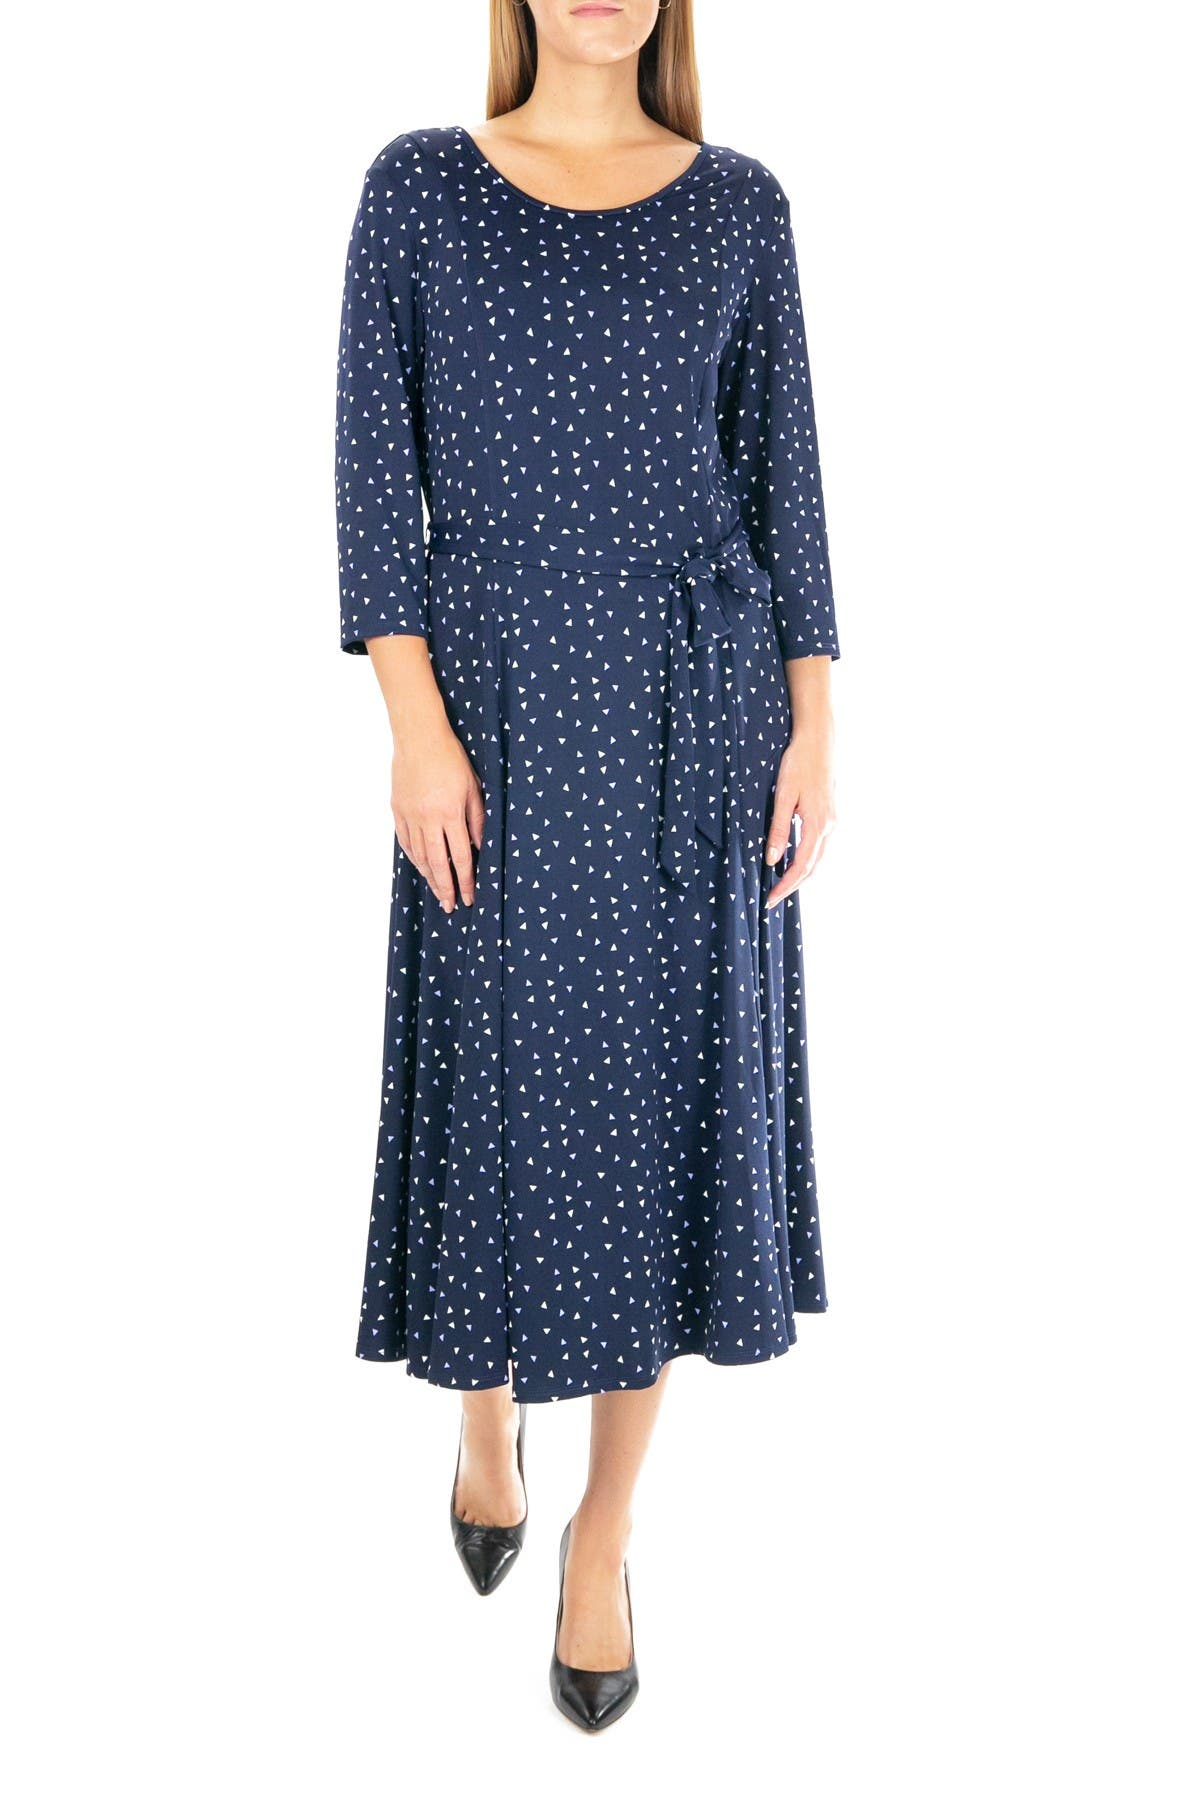 Image of Nina Leonard Crew Neck 3/4 Length Sleeve Midi Dress